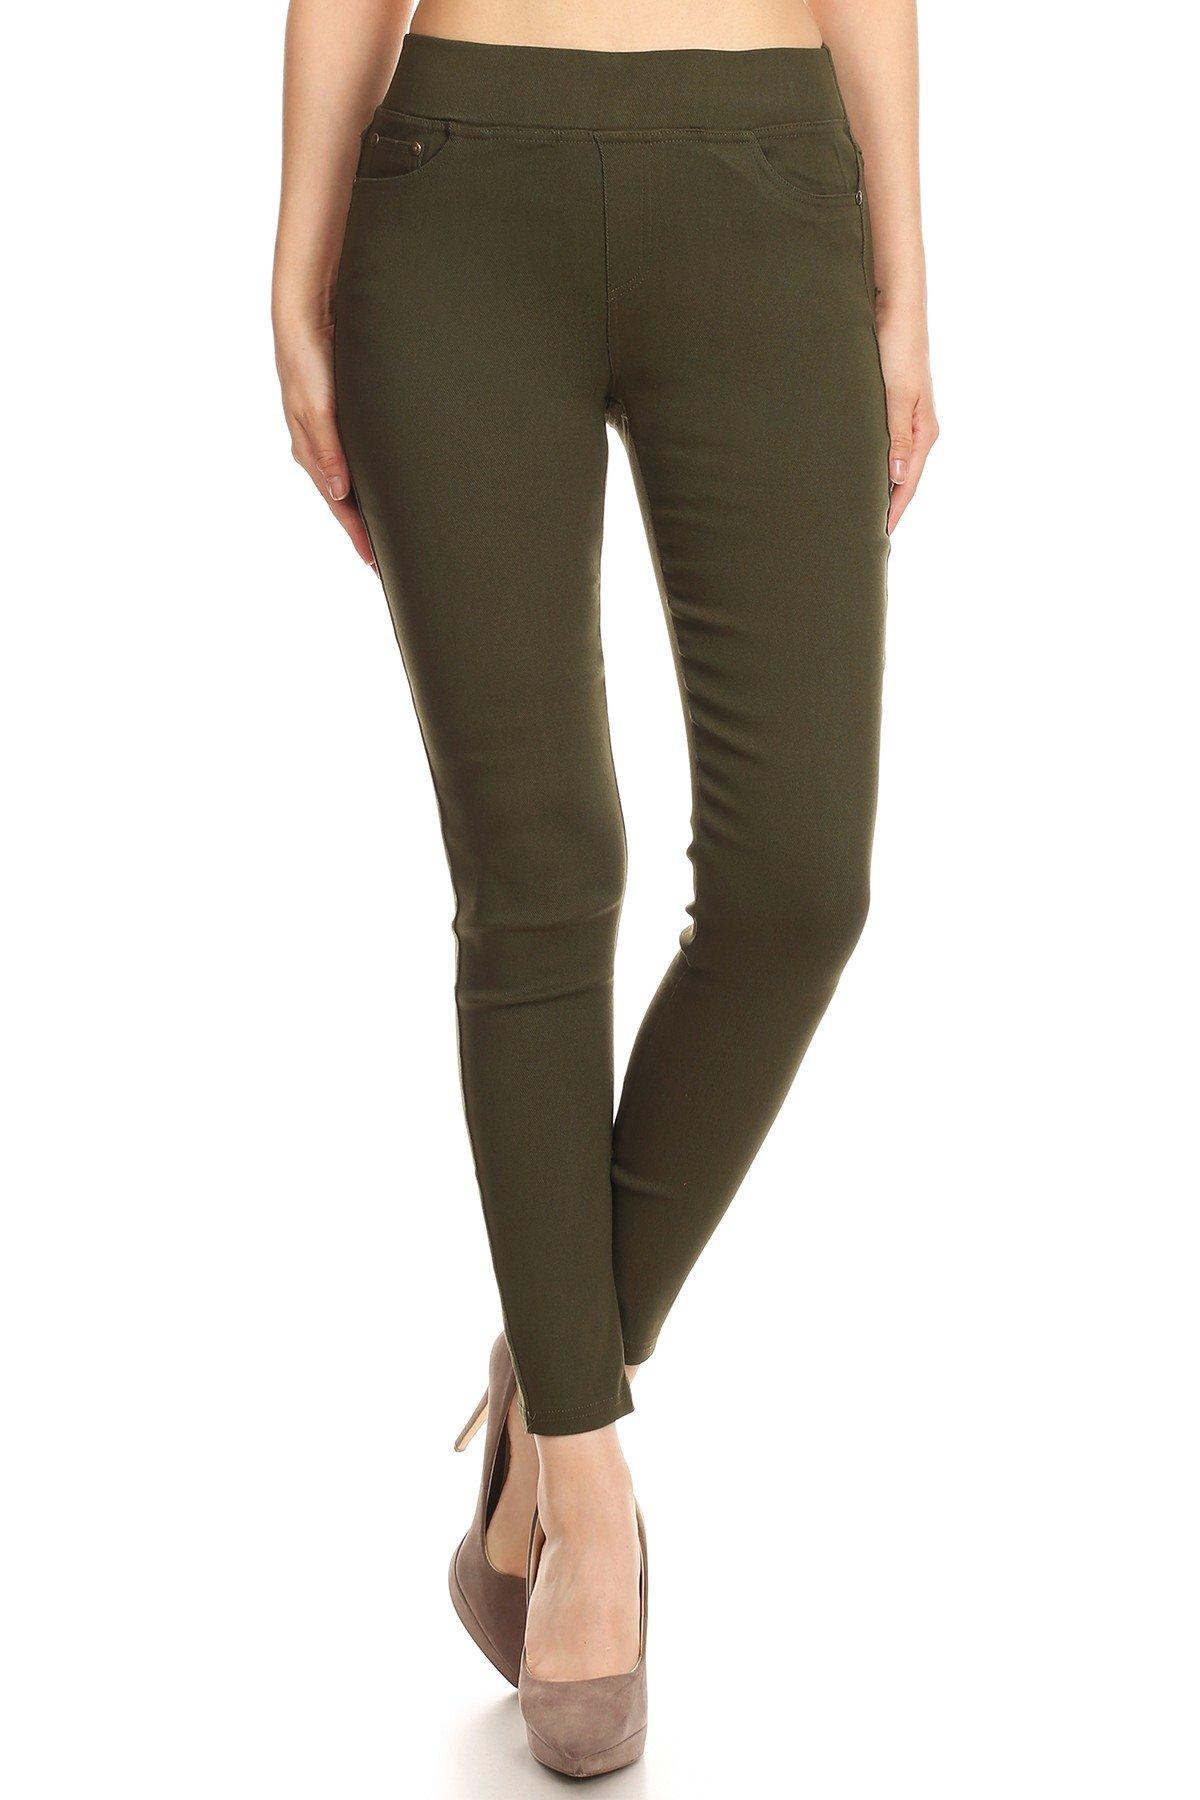 MissMissy Women's Casual Color Denim Slim Fit Skinny Elastic Waist Band Spandex Jeggings Ankle Jeans Pants (Large, Olive)